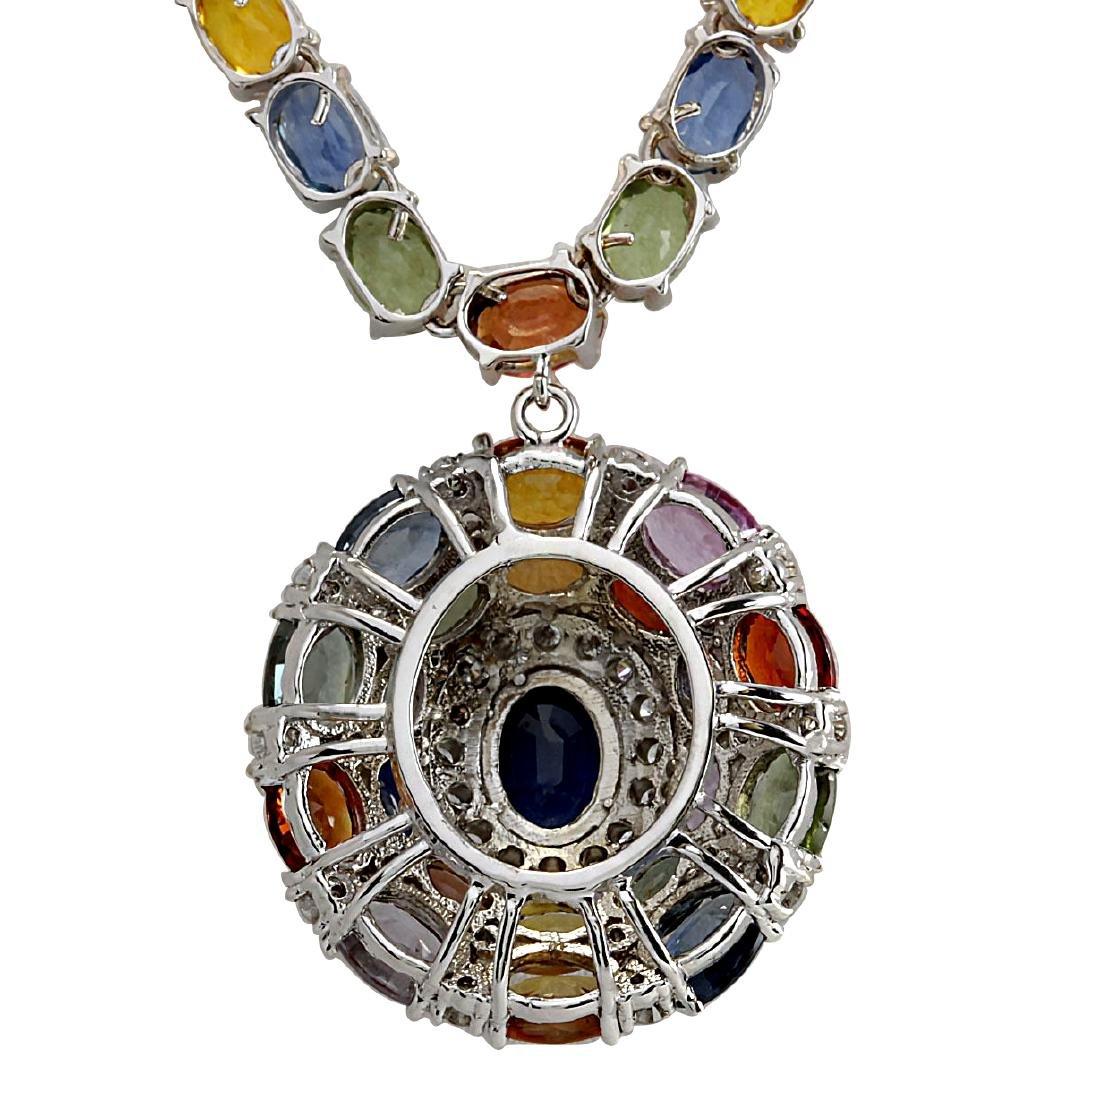 46.99CTW Natural Ceylon Sapphire And Diamond Necklace - 2